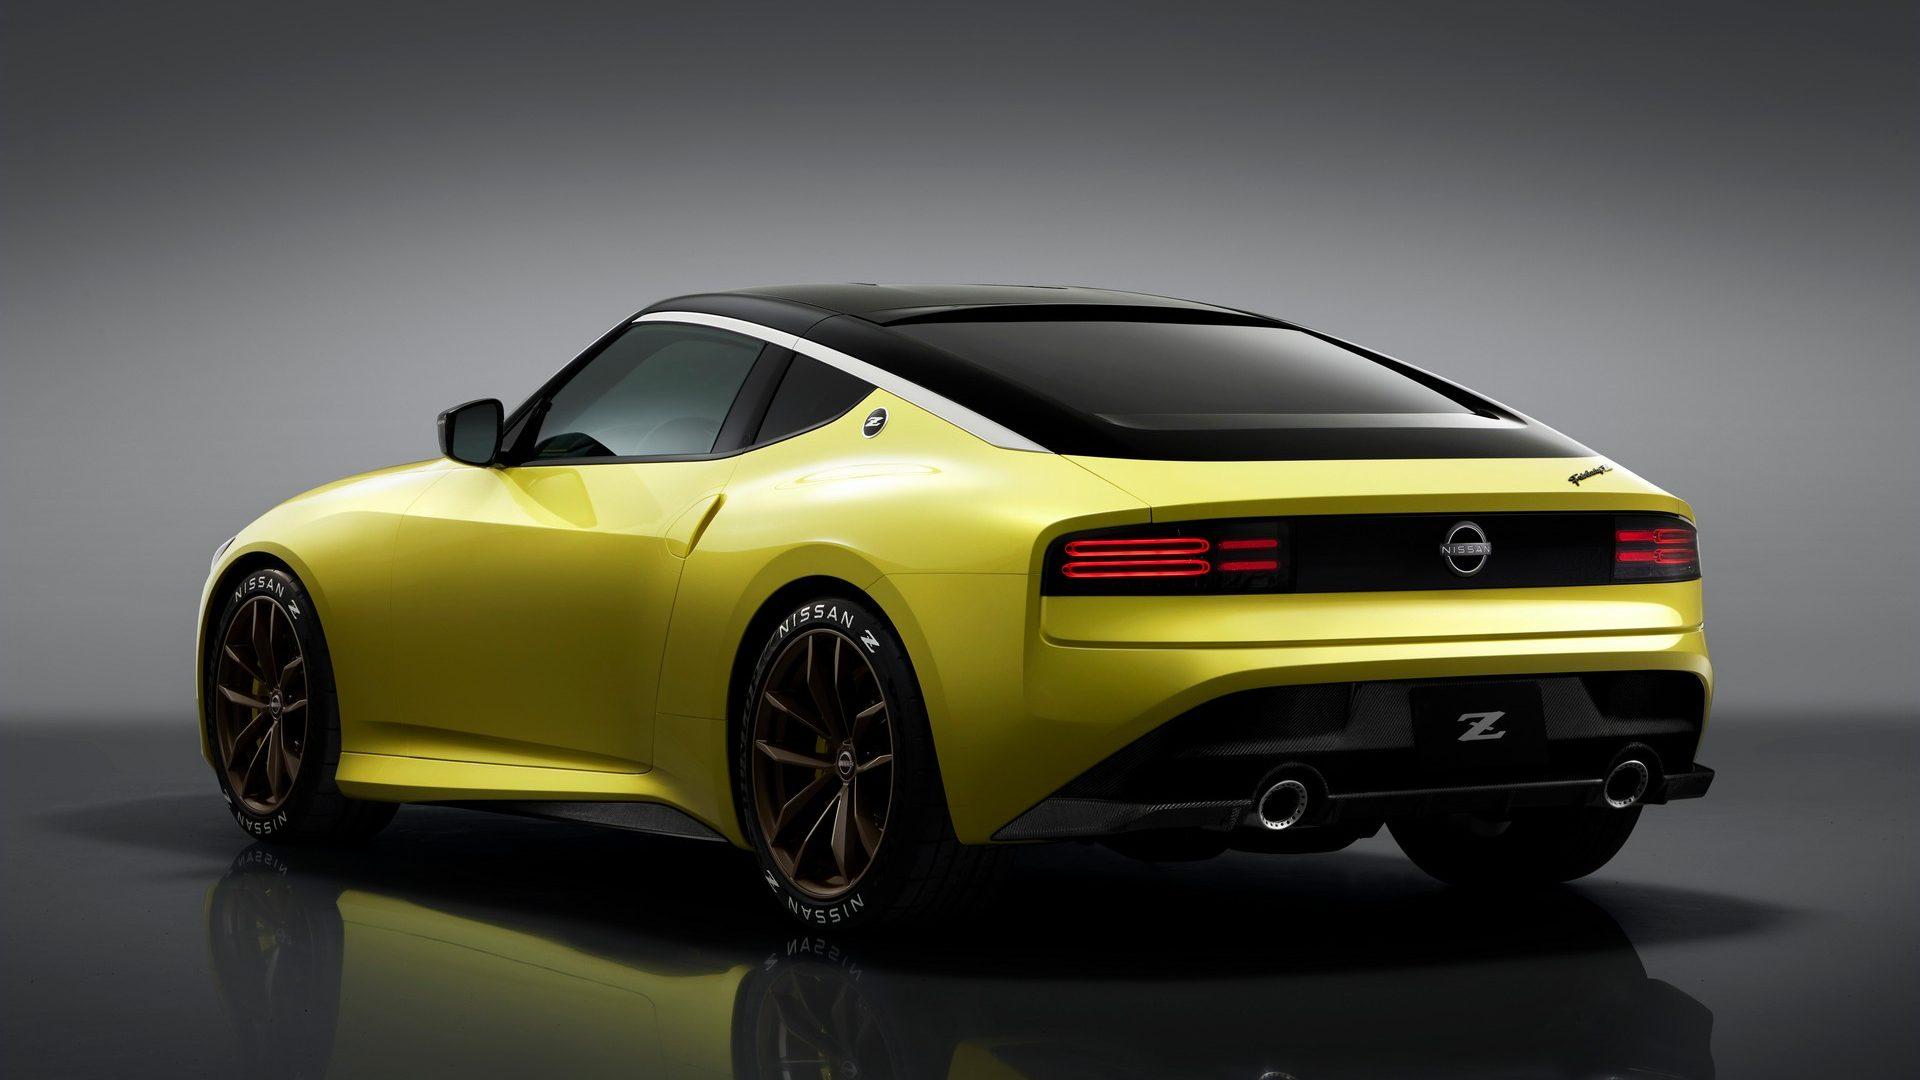 2020-Nissan-Z-Proto-03